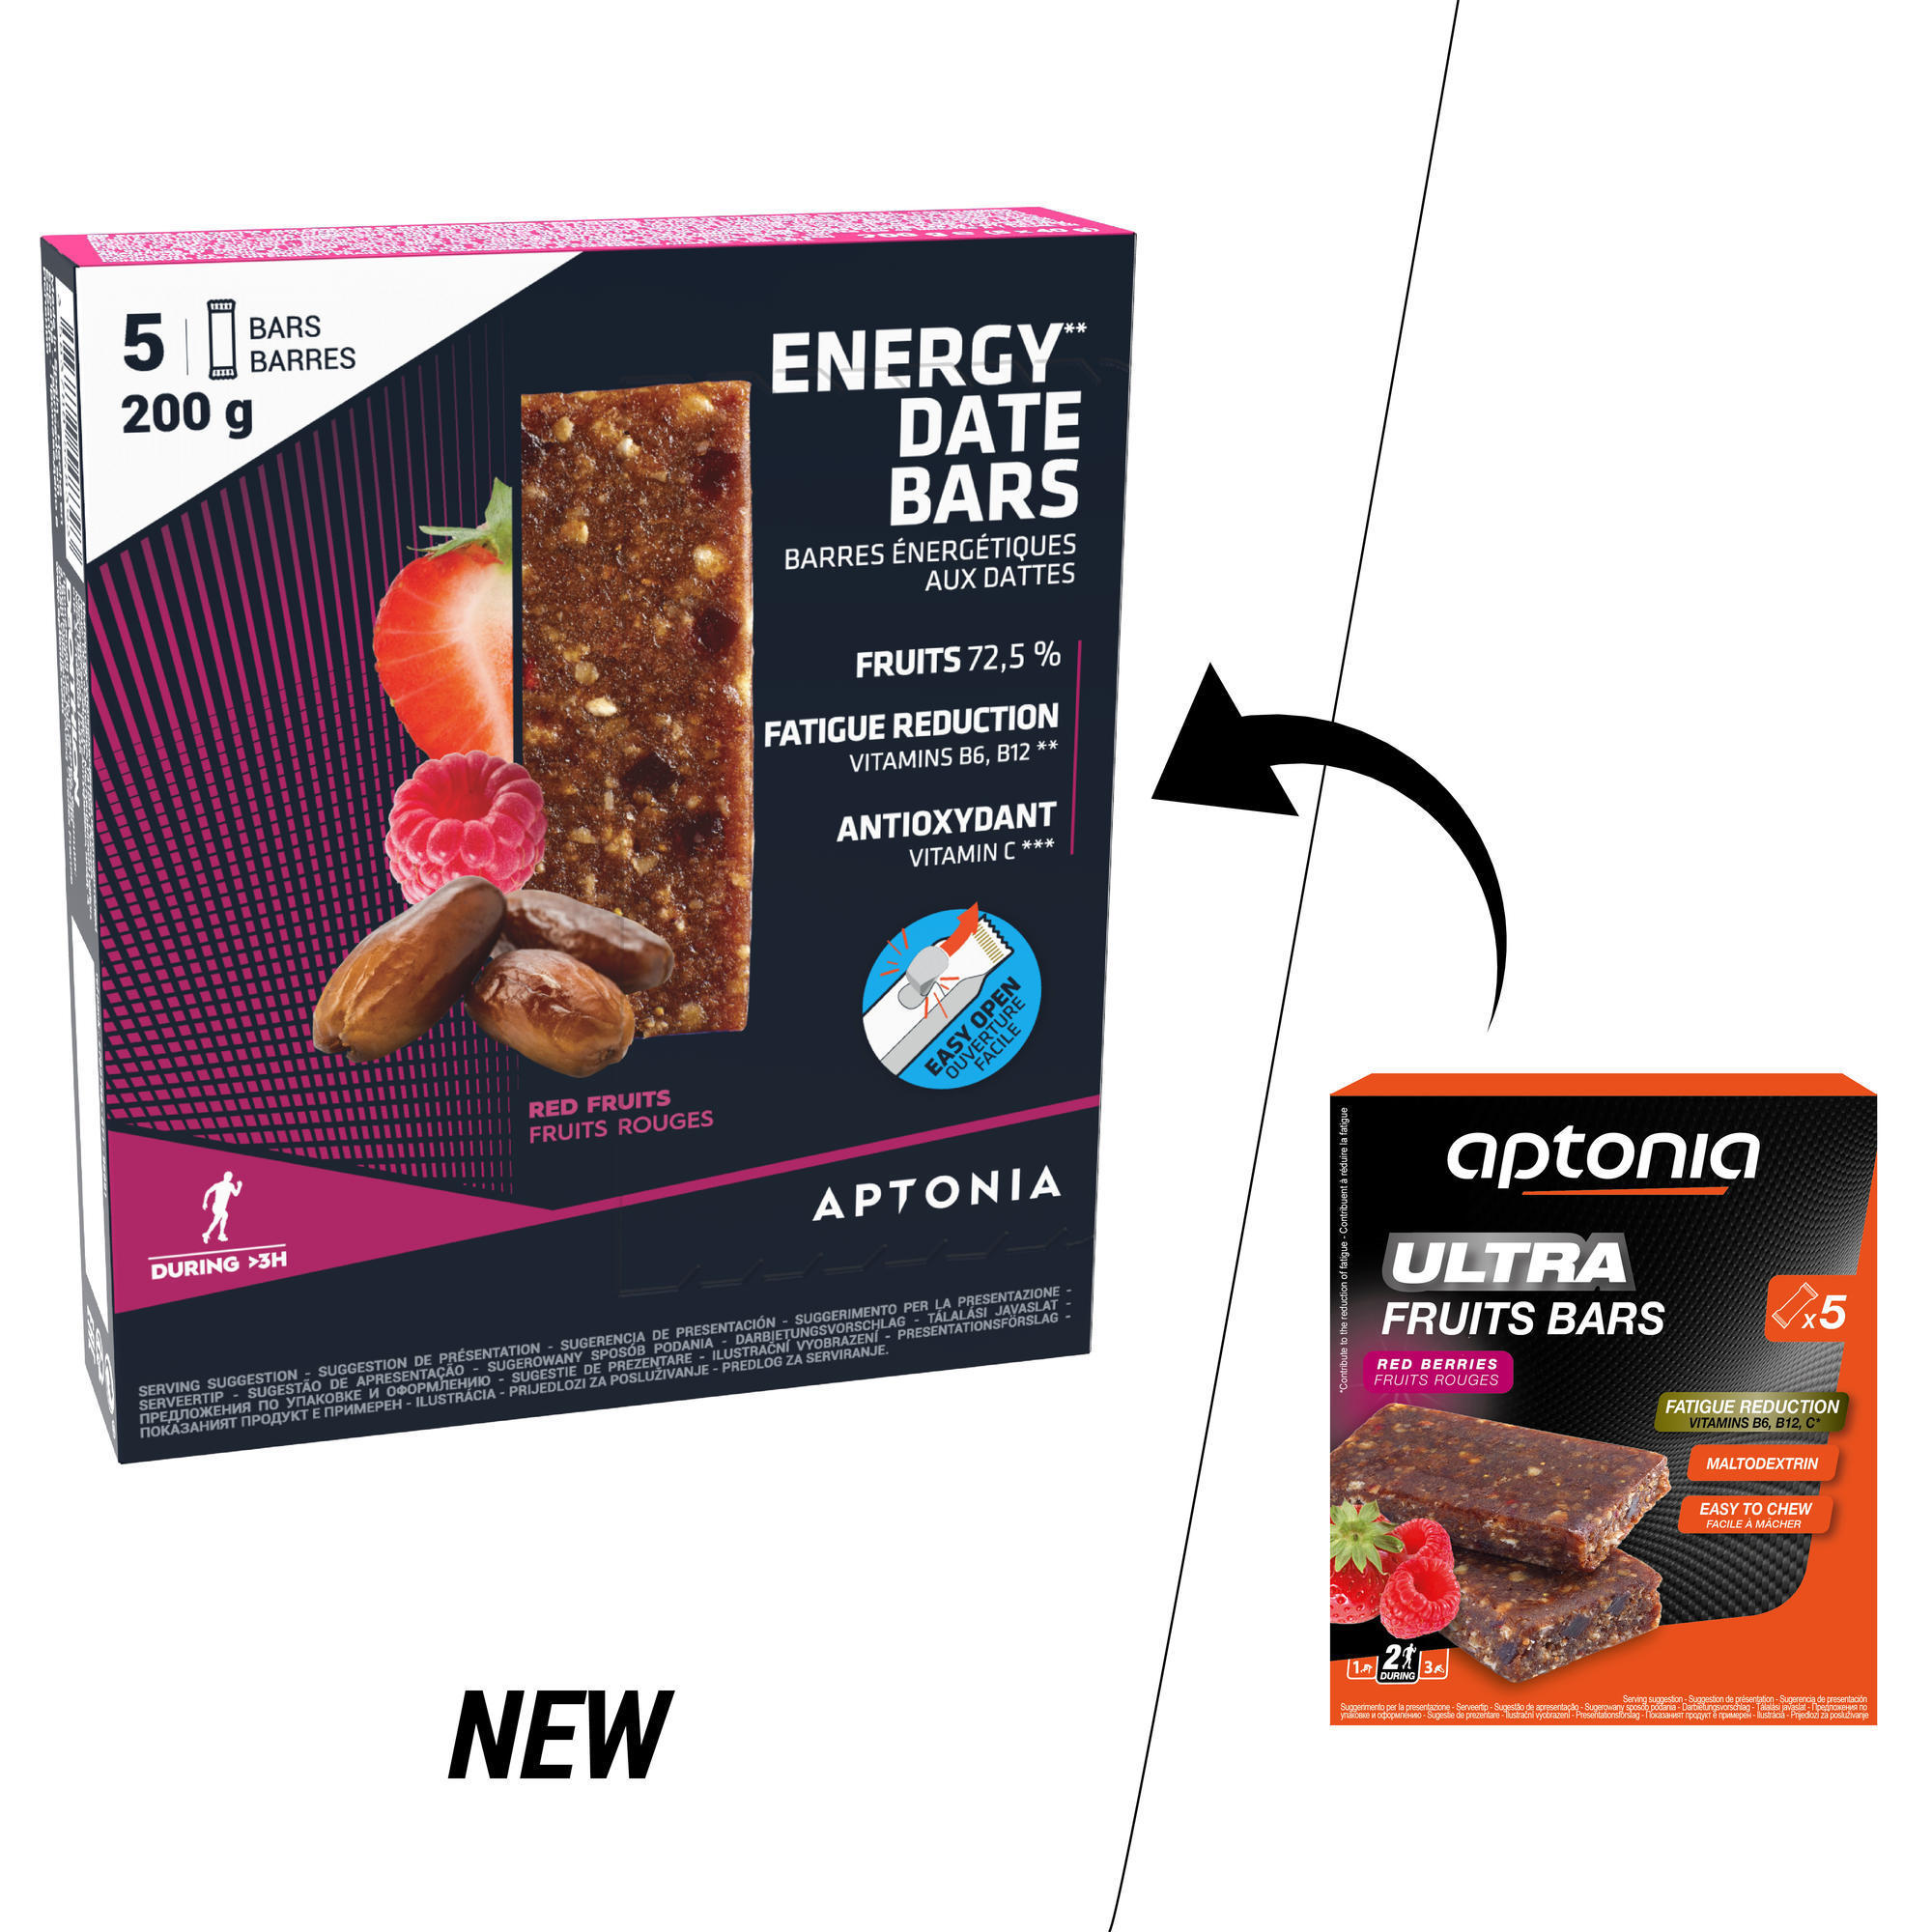 Aptonia Energiereep met dadels en rode vruchten 5 x 40 g